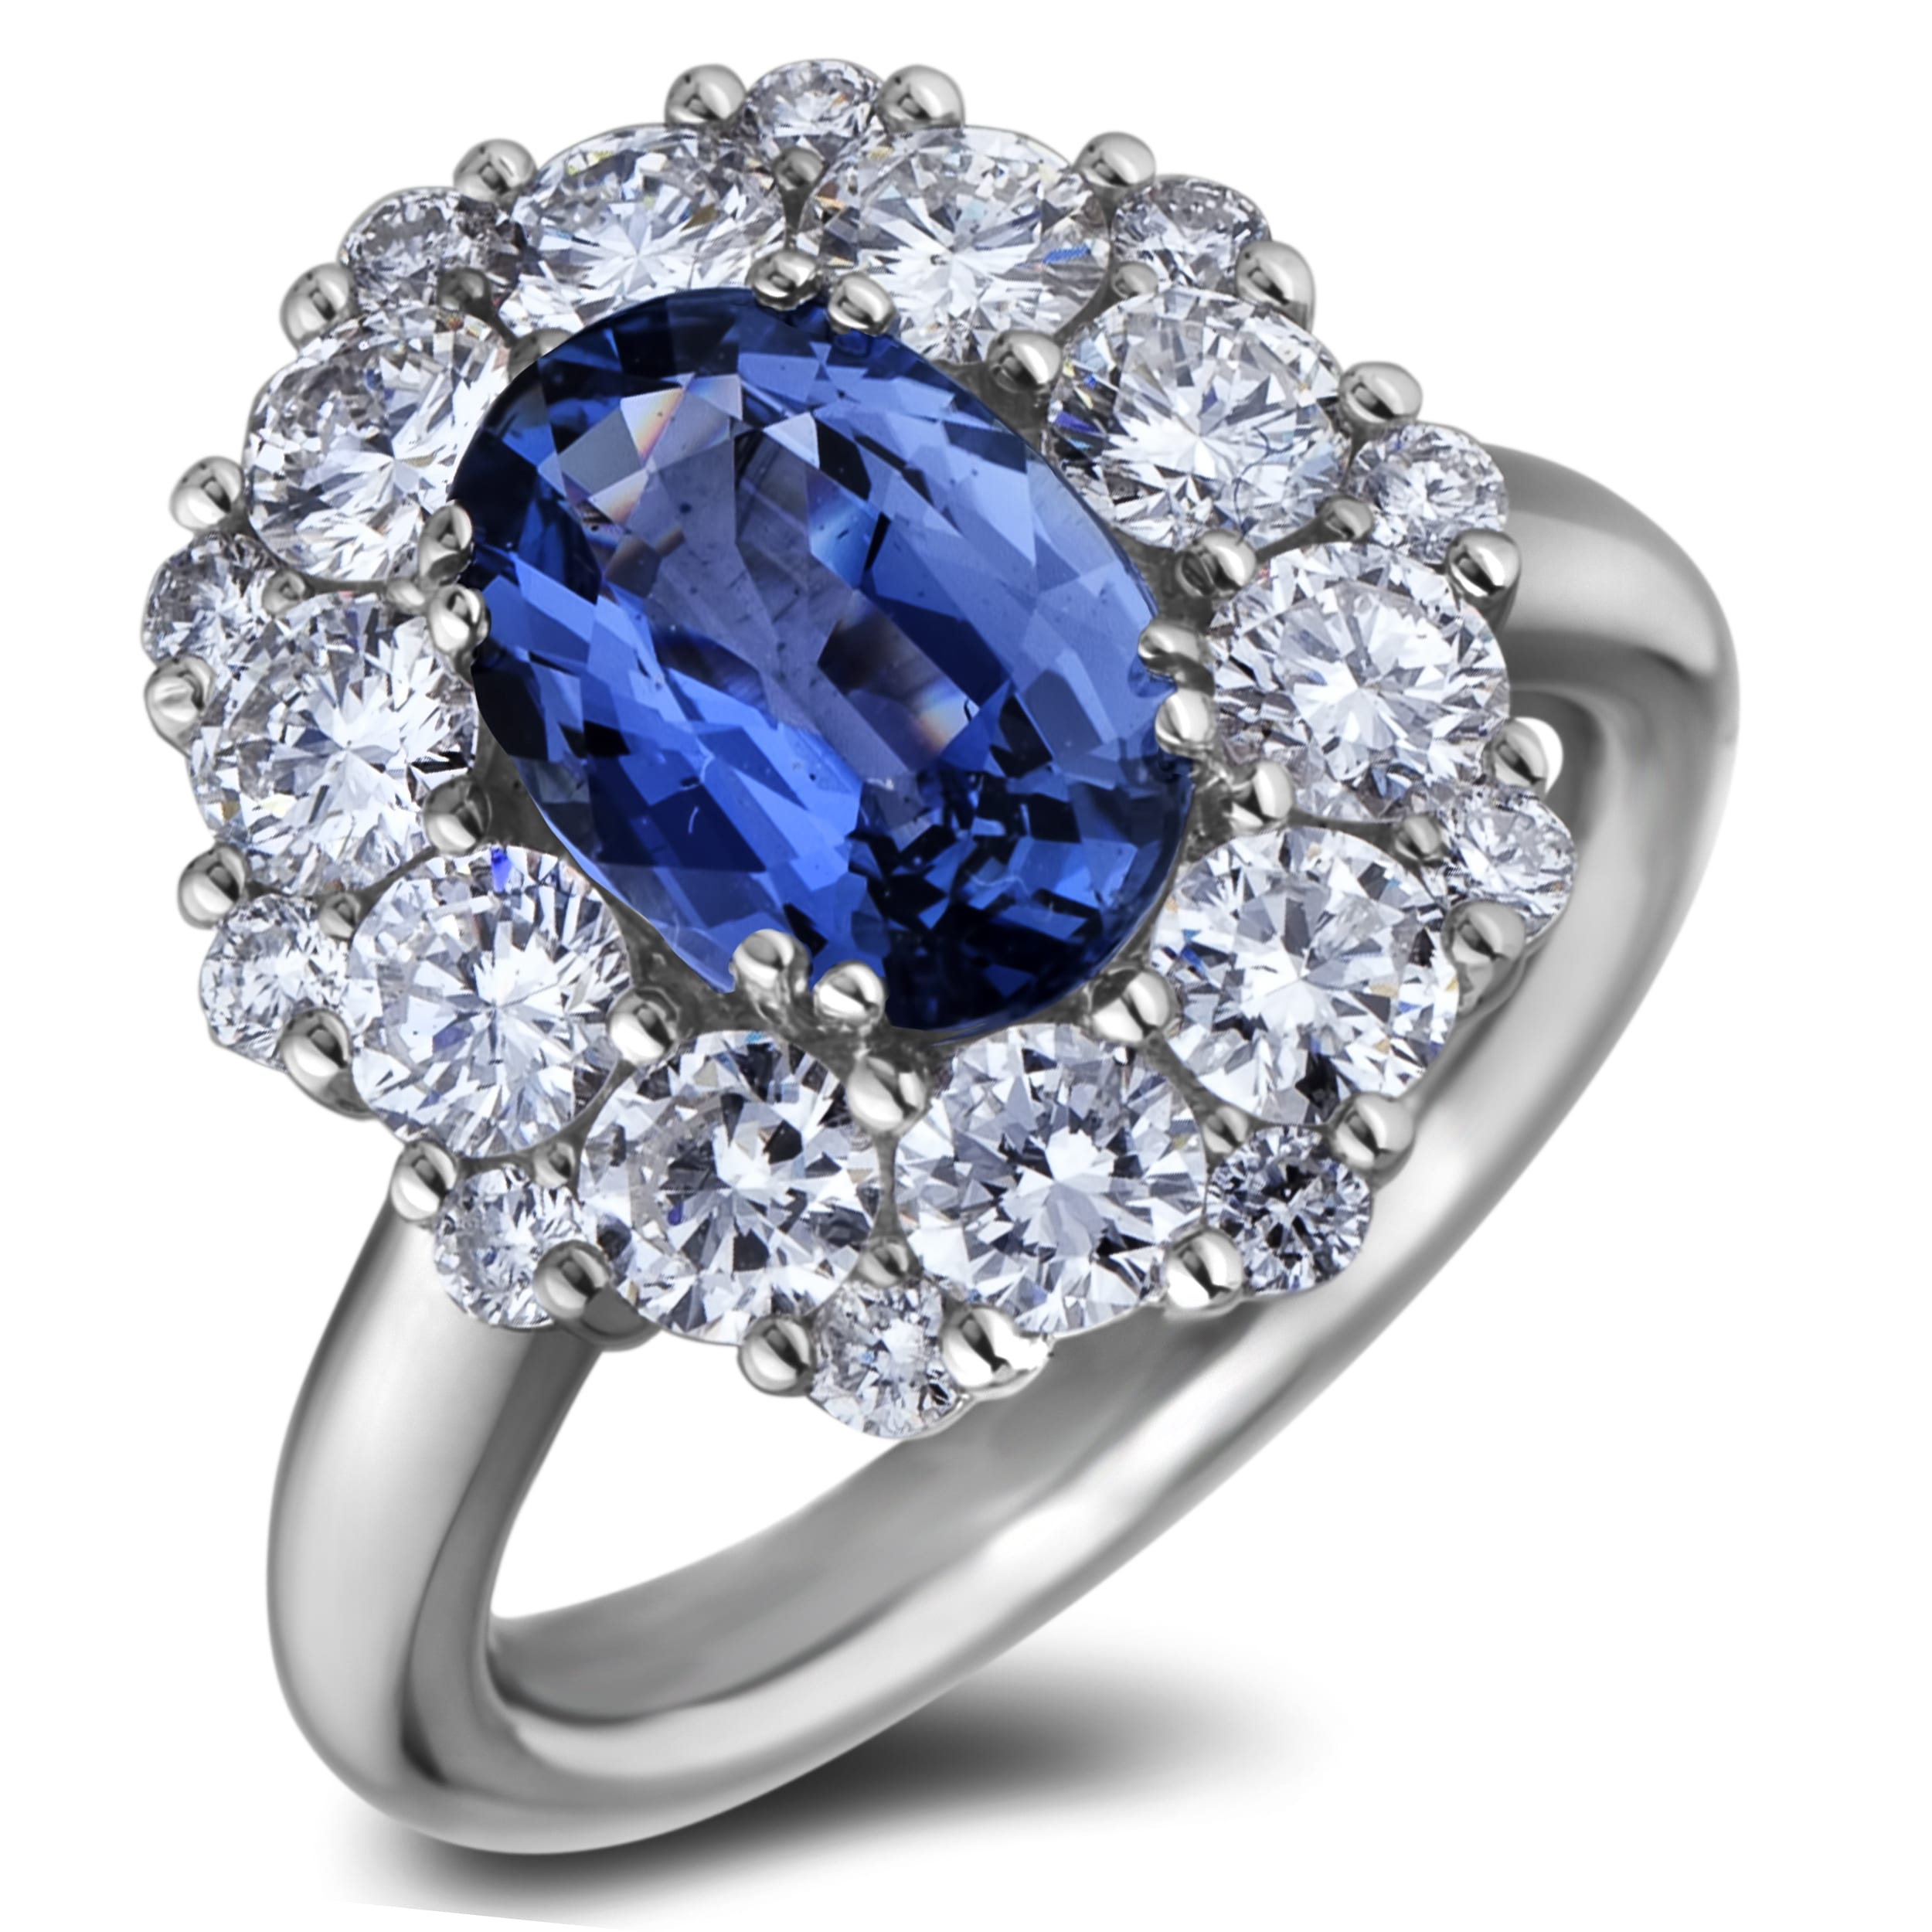 Cornflower Blue Ceylon Sapphire Amp Diamond Ring Lugaro